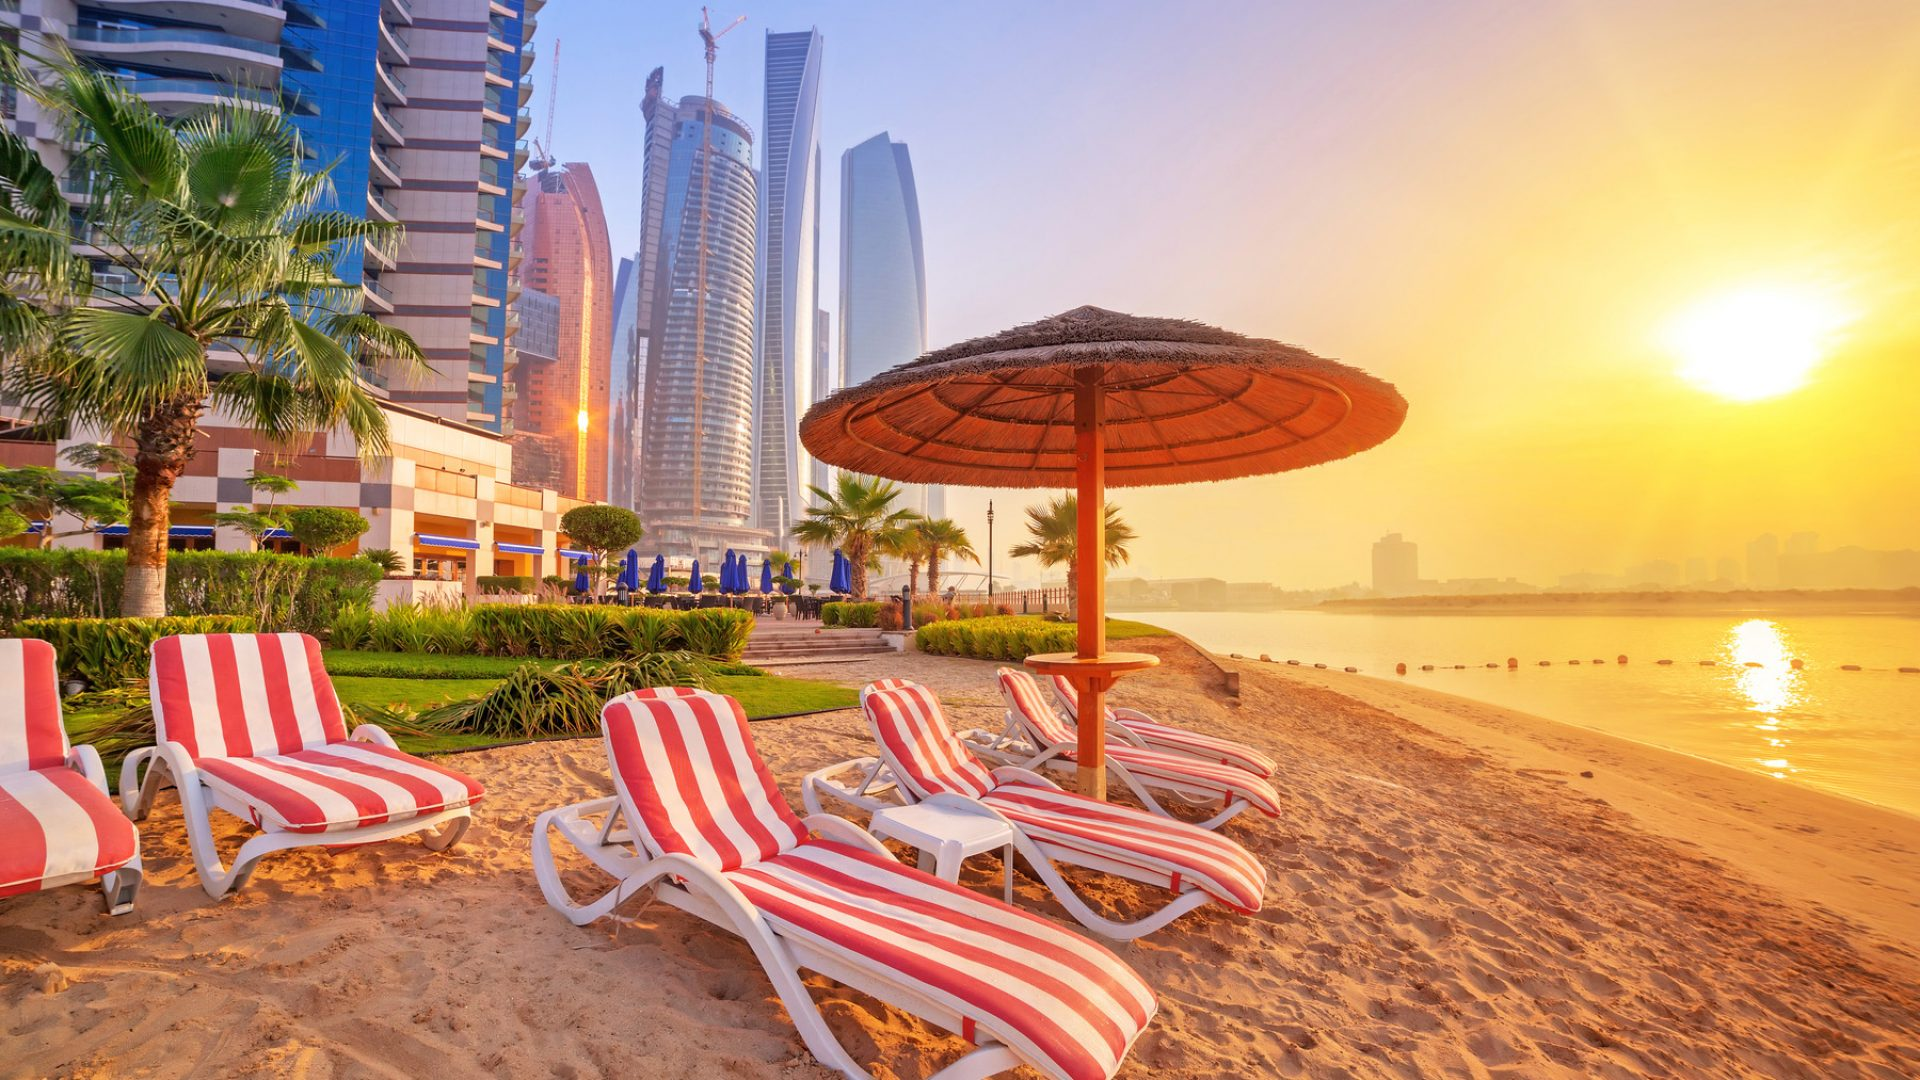 UAE climate